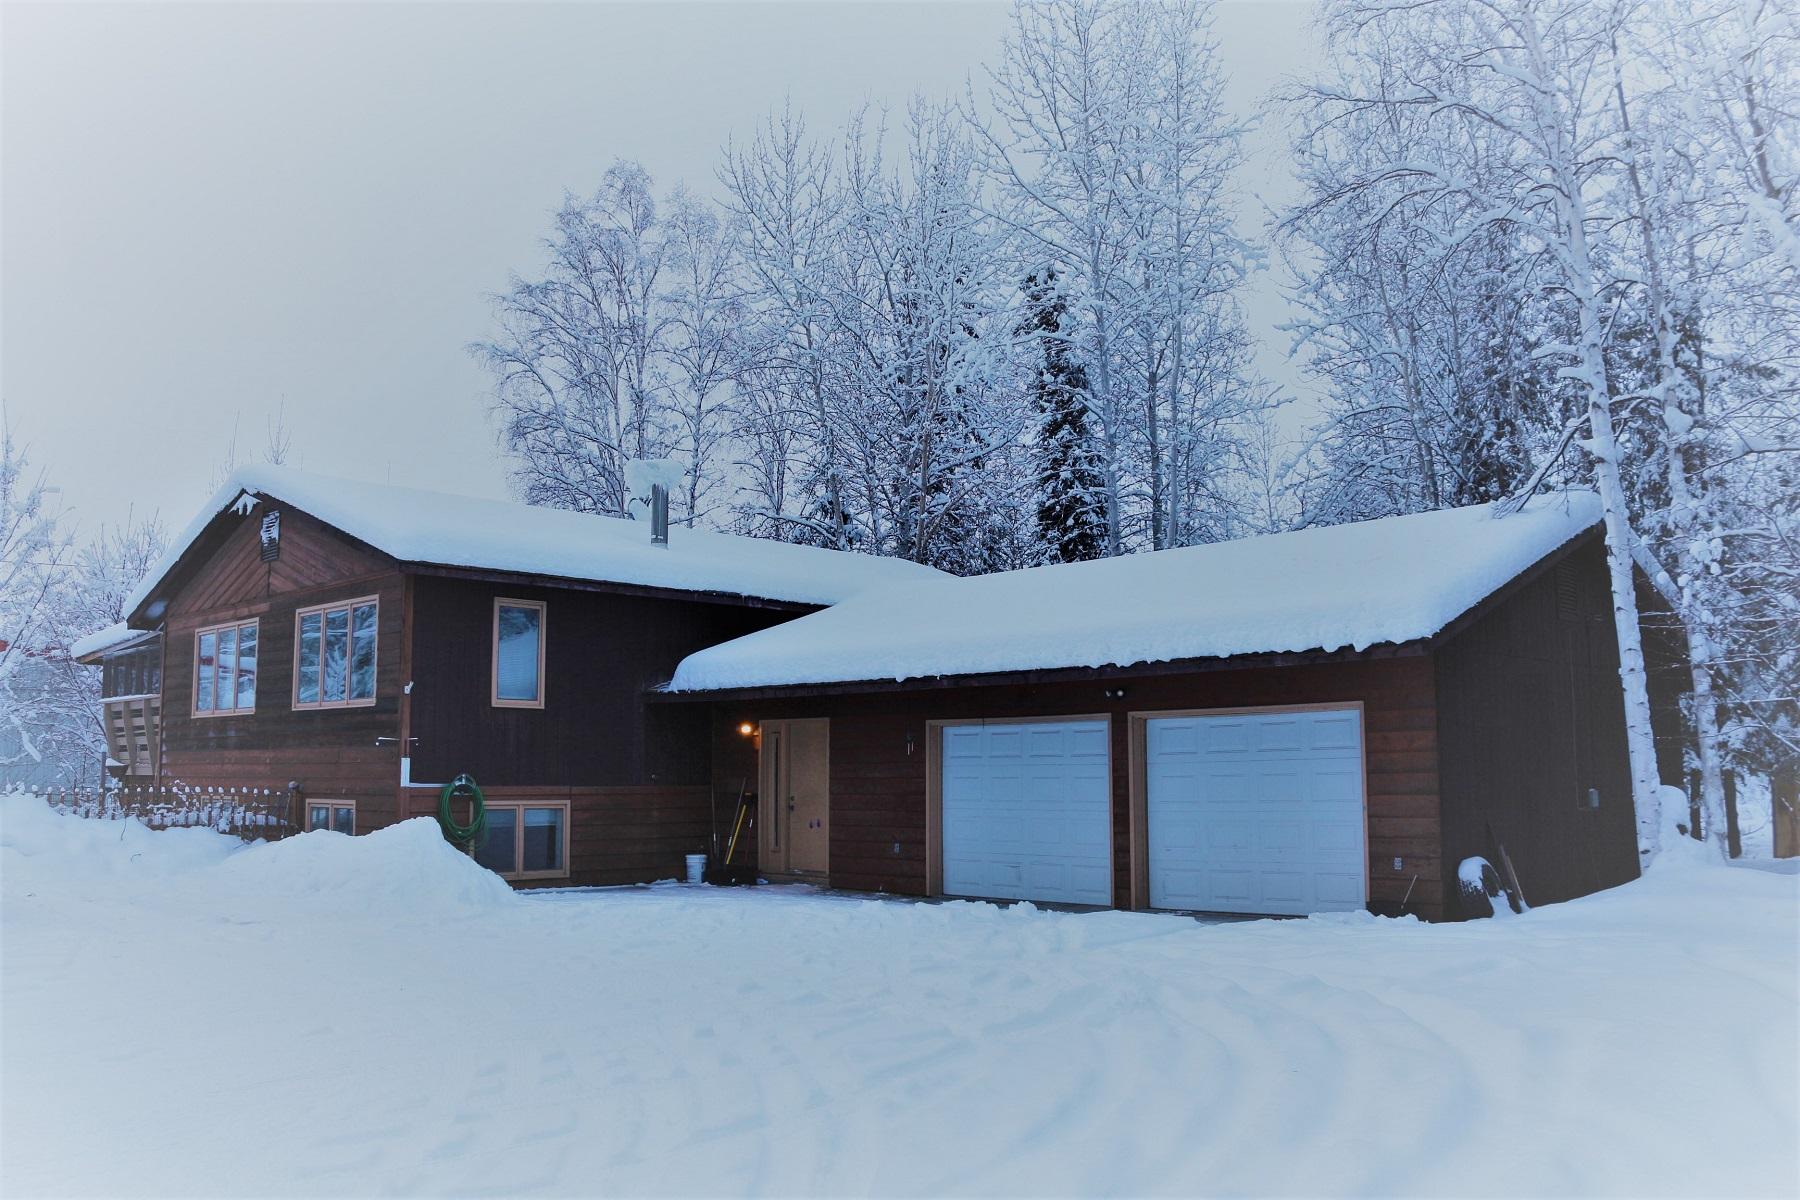 Duplex Homes 为 销售 在 North Pole, 阿拉斯加州 99705 美国